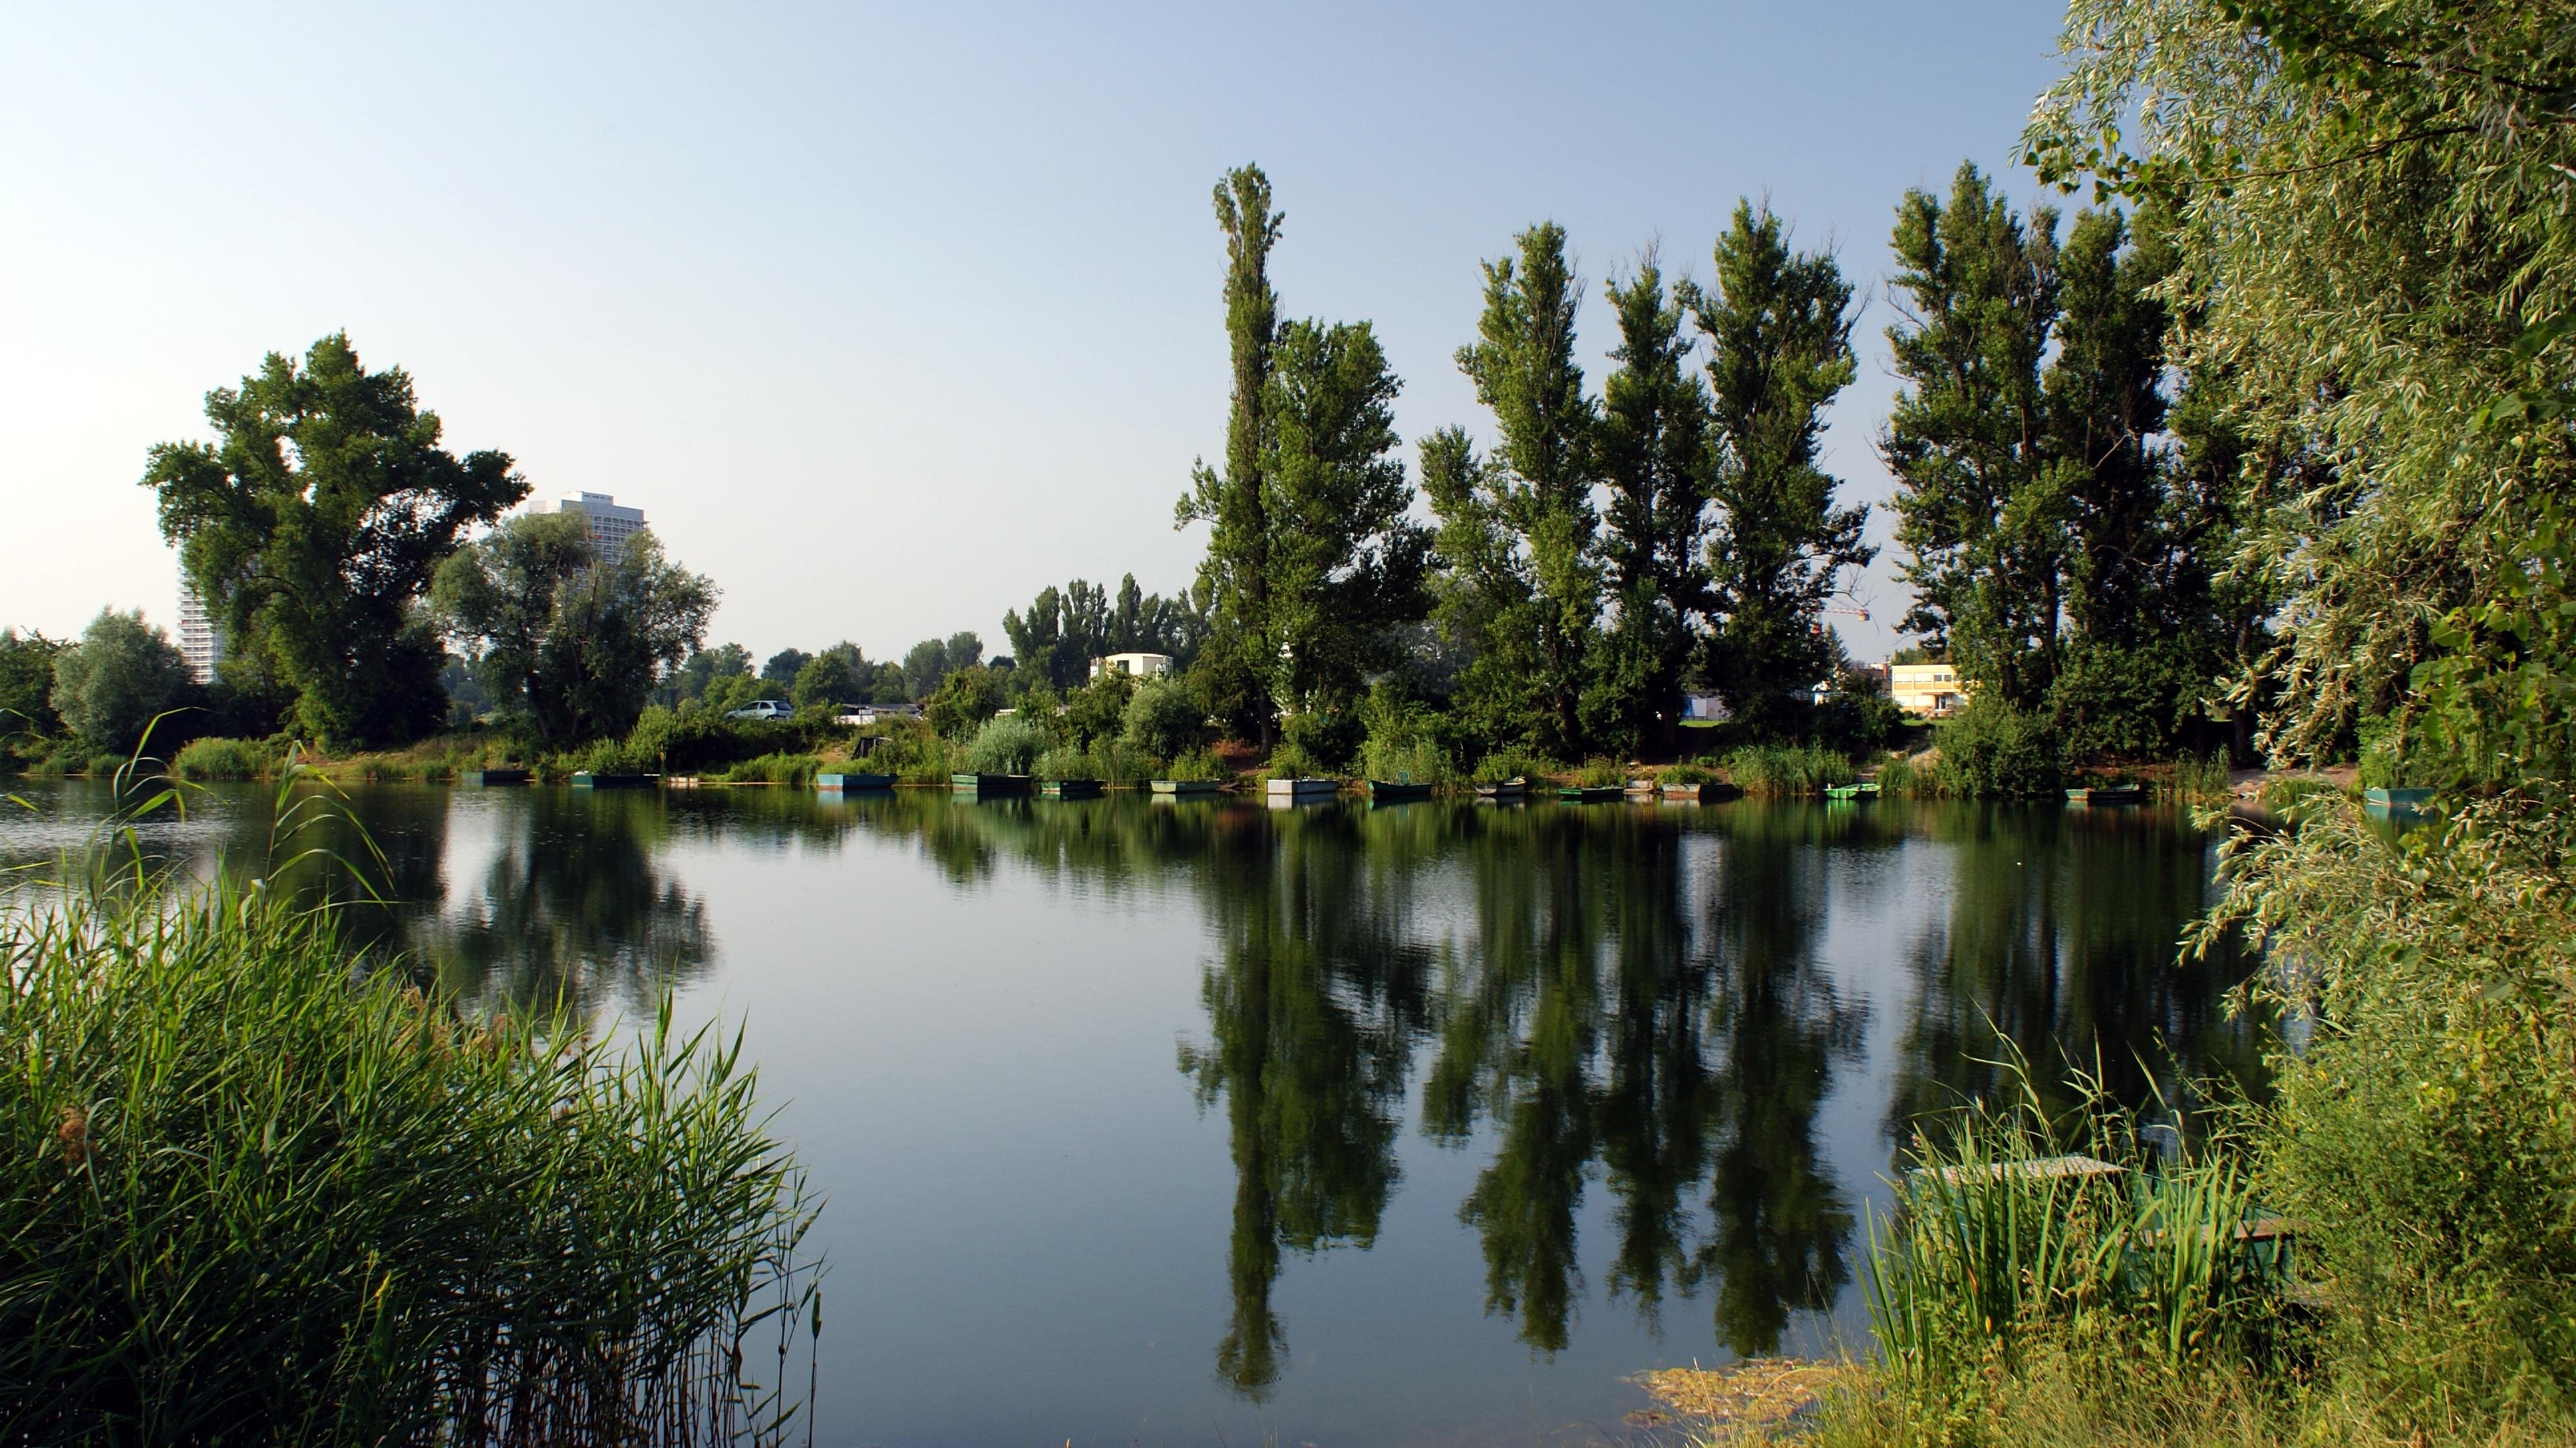 Habitat Düsseldorf free images tree nature forest wilderness lake river pond